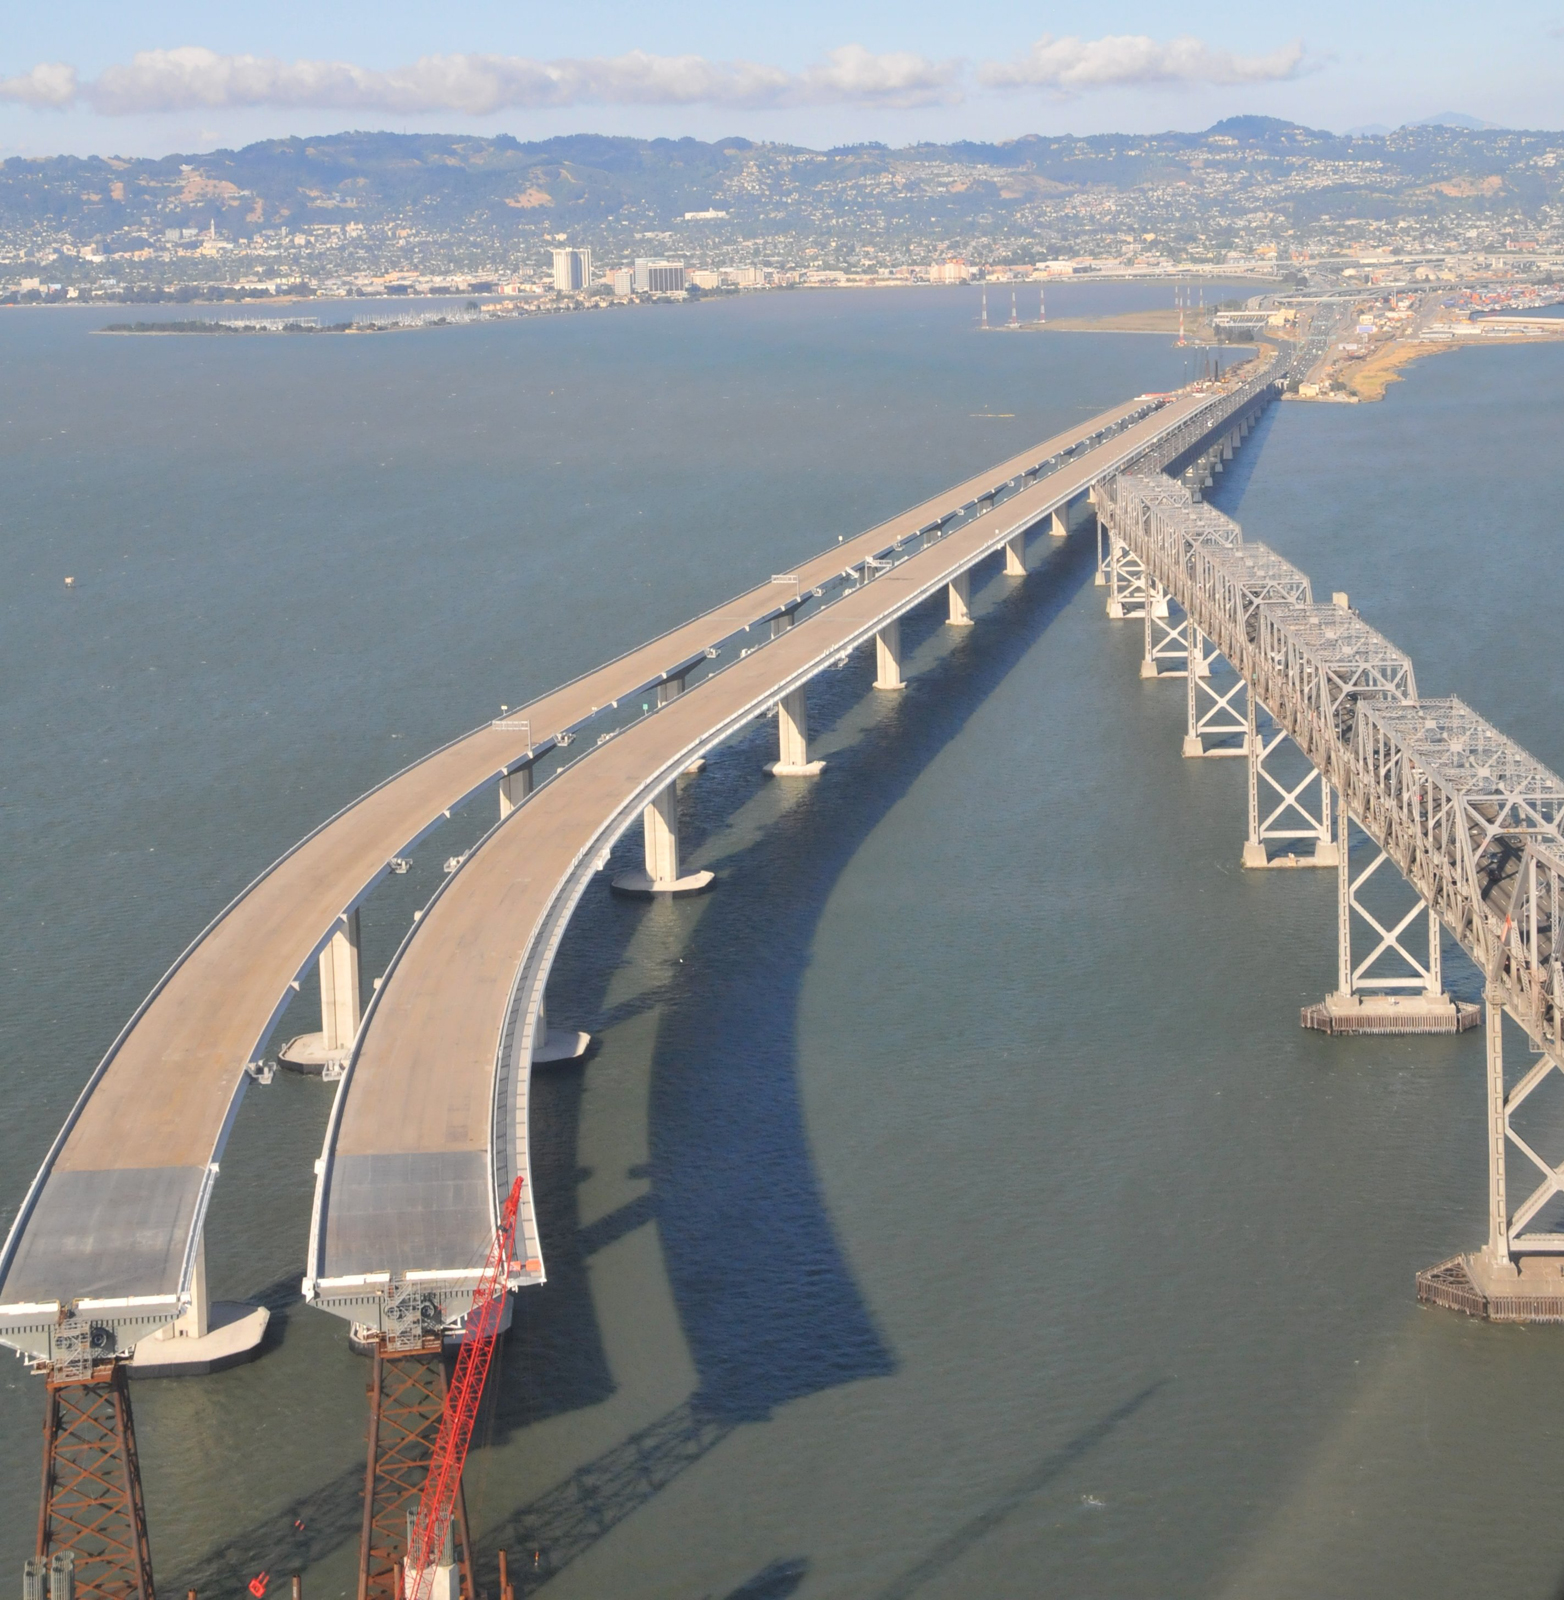 Arch and city bridge